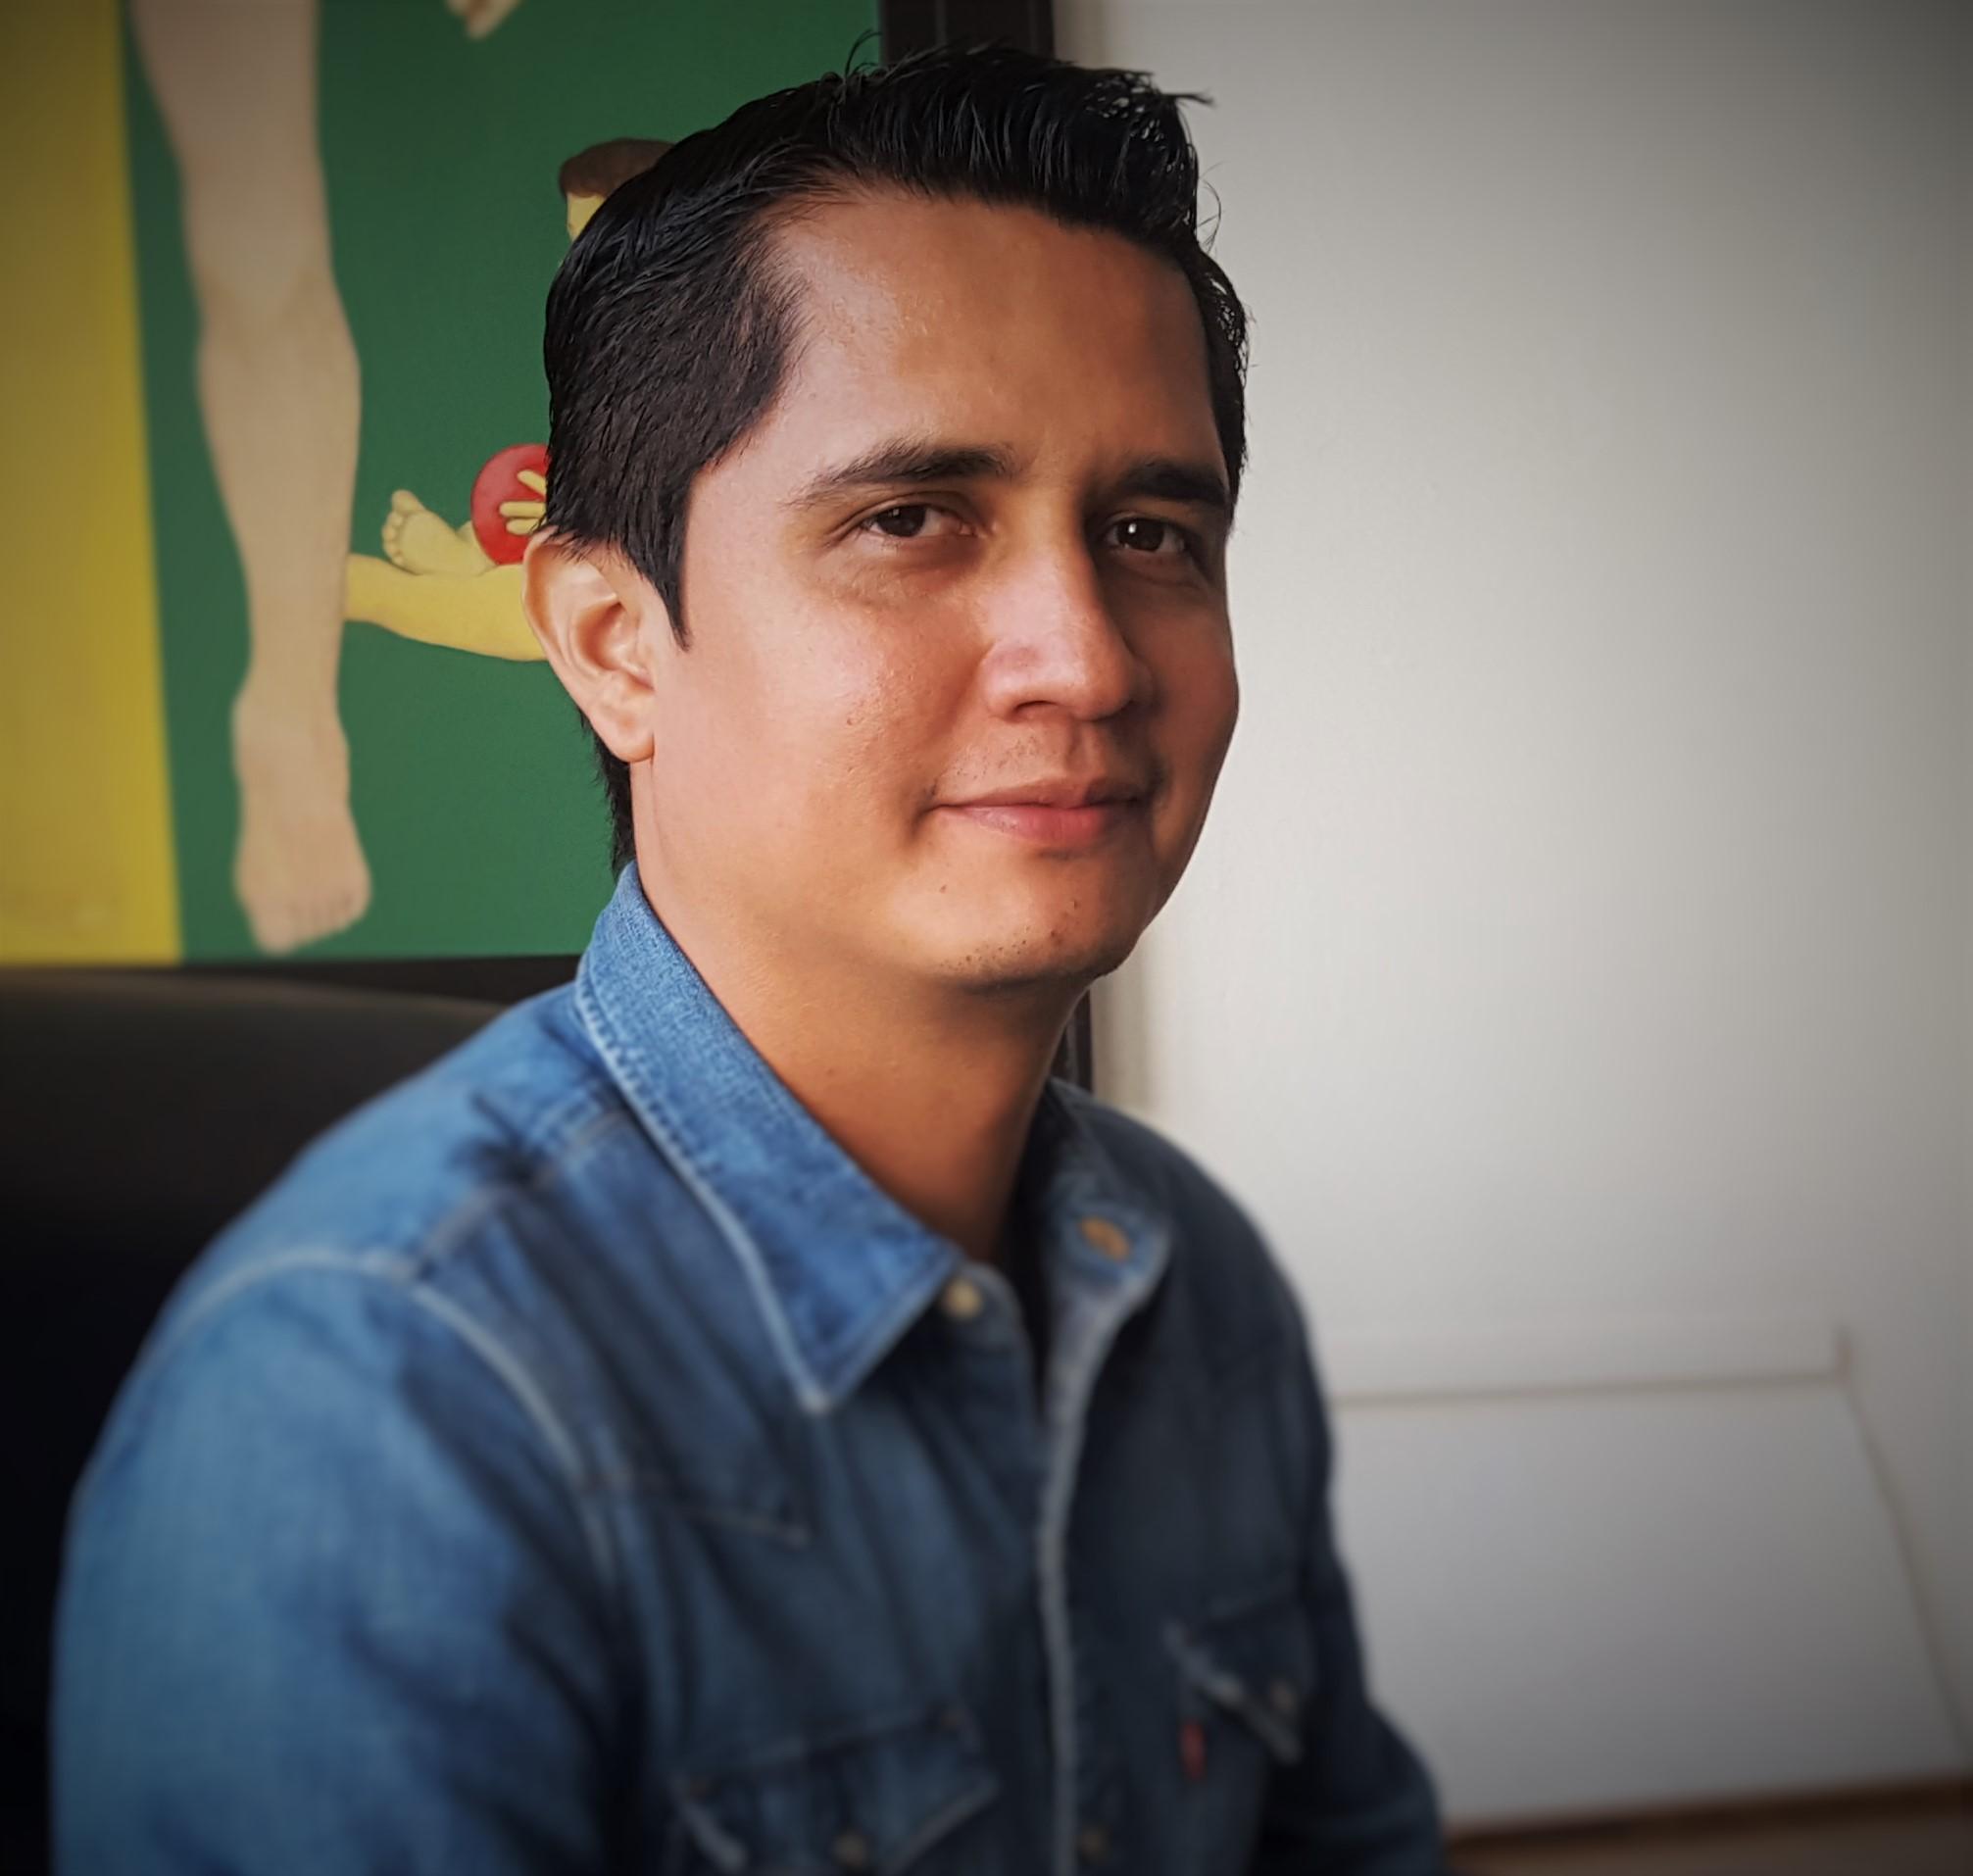 LIC. ALEXANDER BARRETO MENDOZA